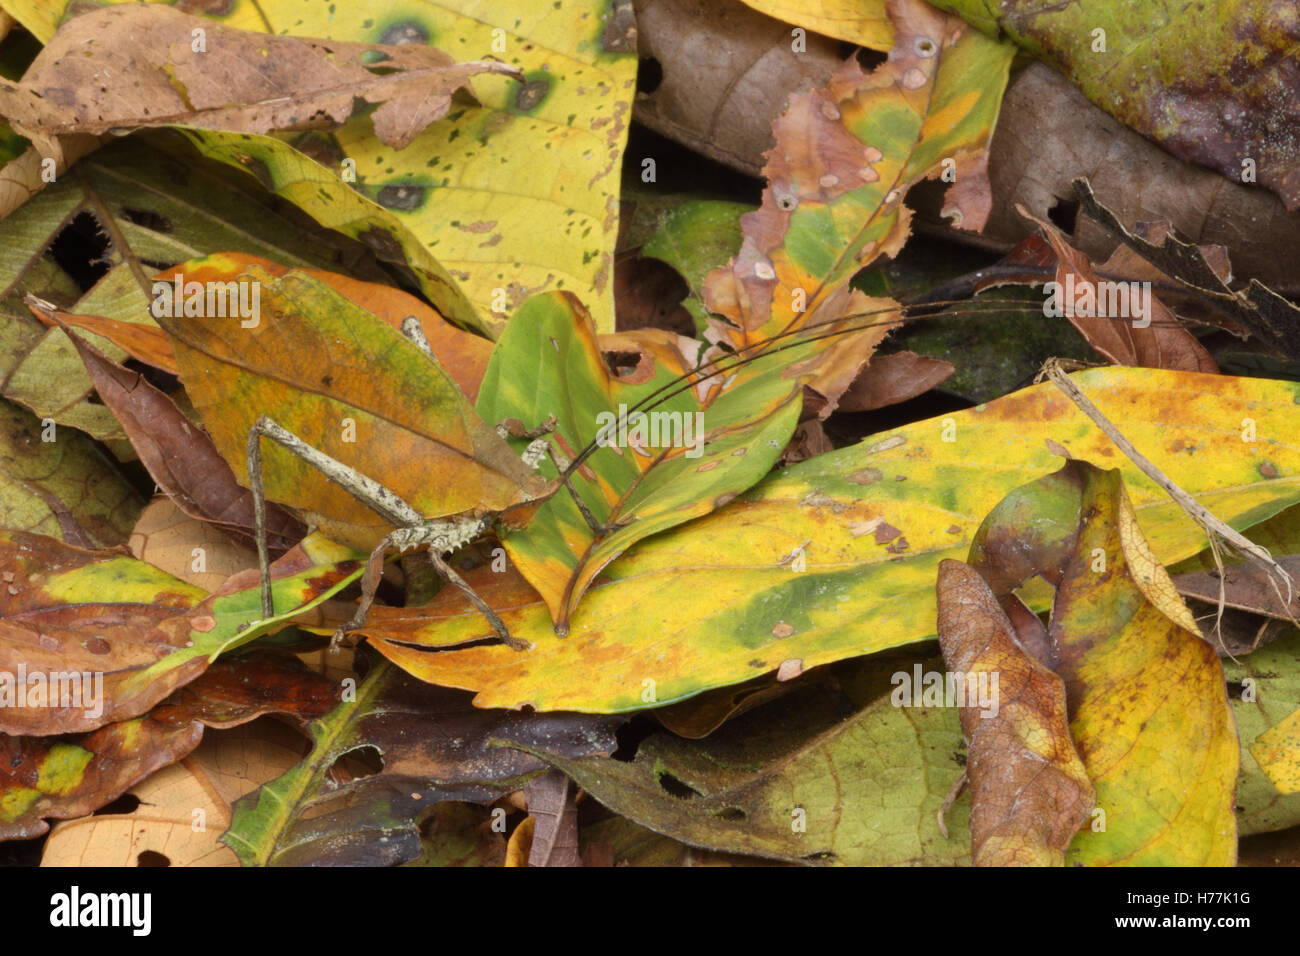 Leaf-mimic Katydid (Mimetica sp.) camouflaged in rainforest leaf litter, La Selva Biological Station, Costa Rica. - Stock Image